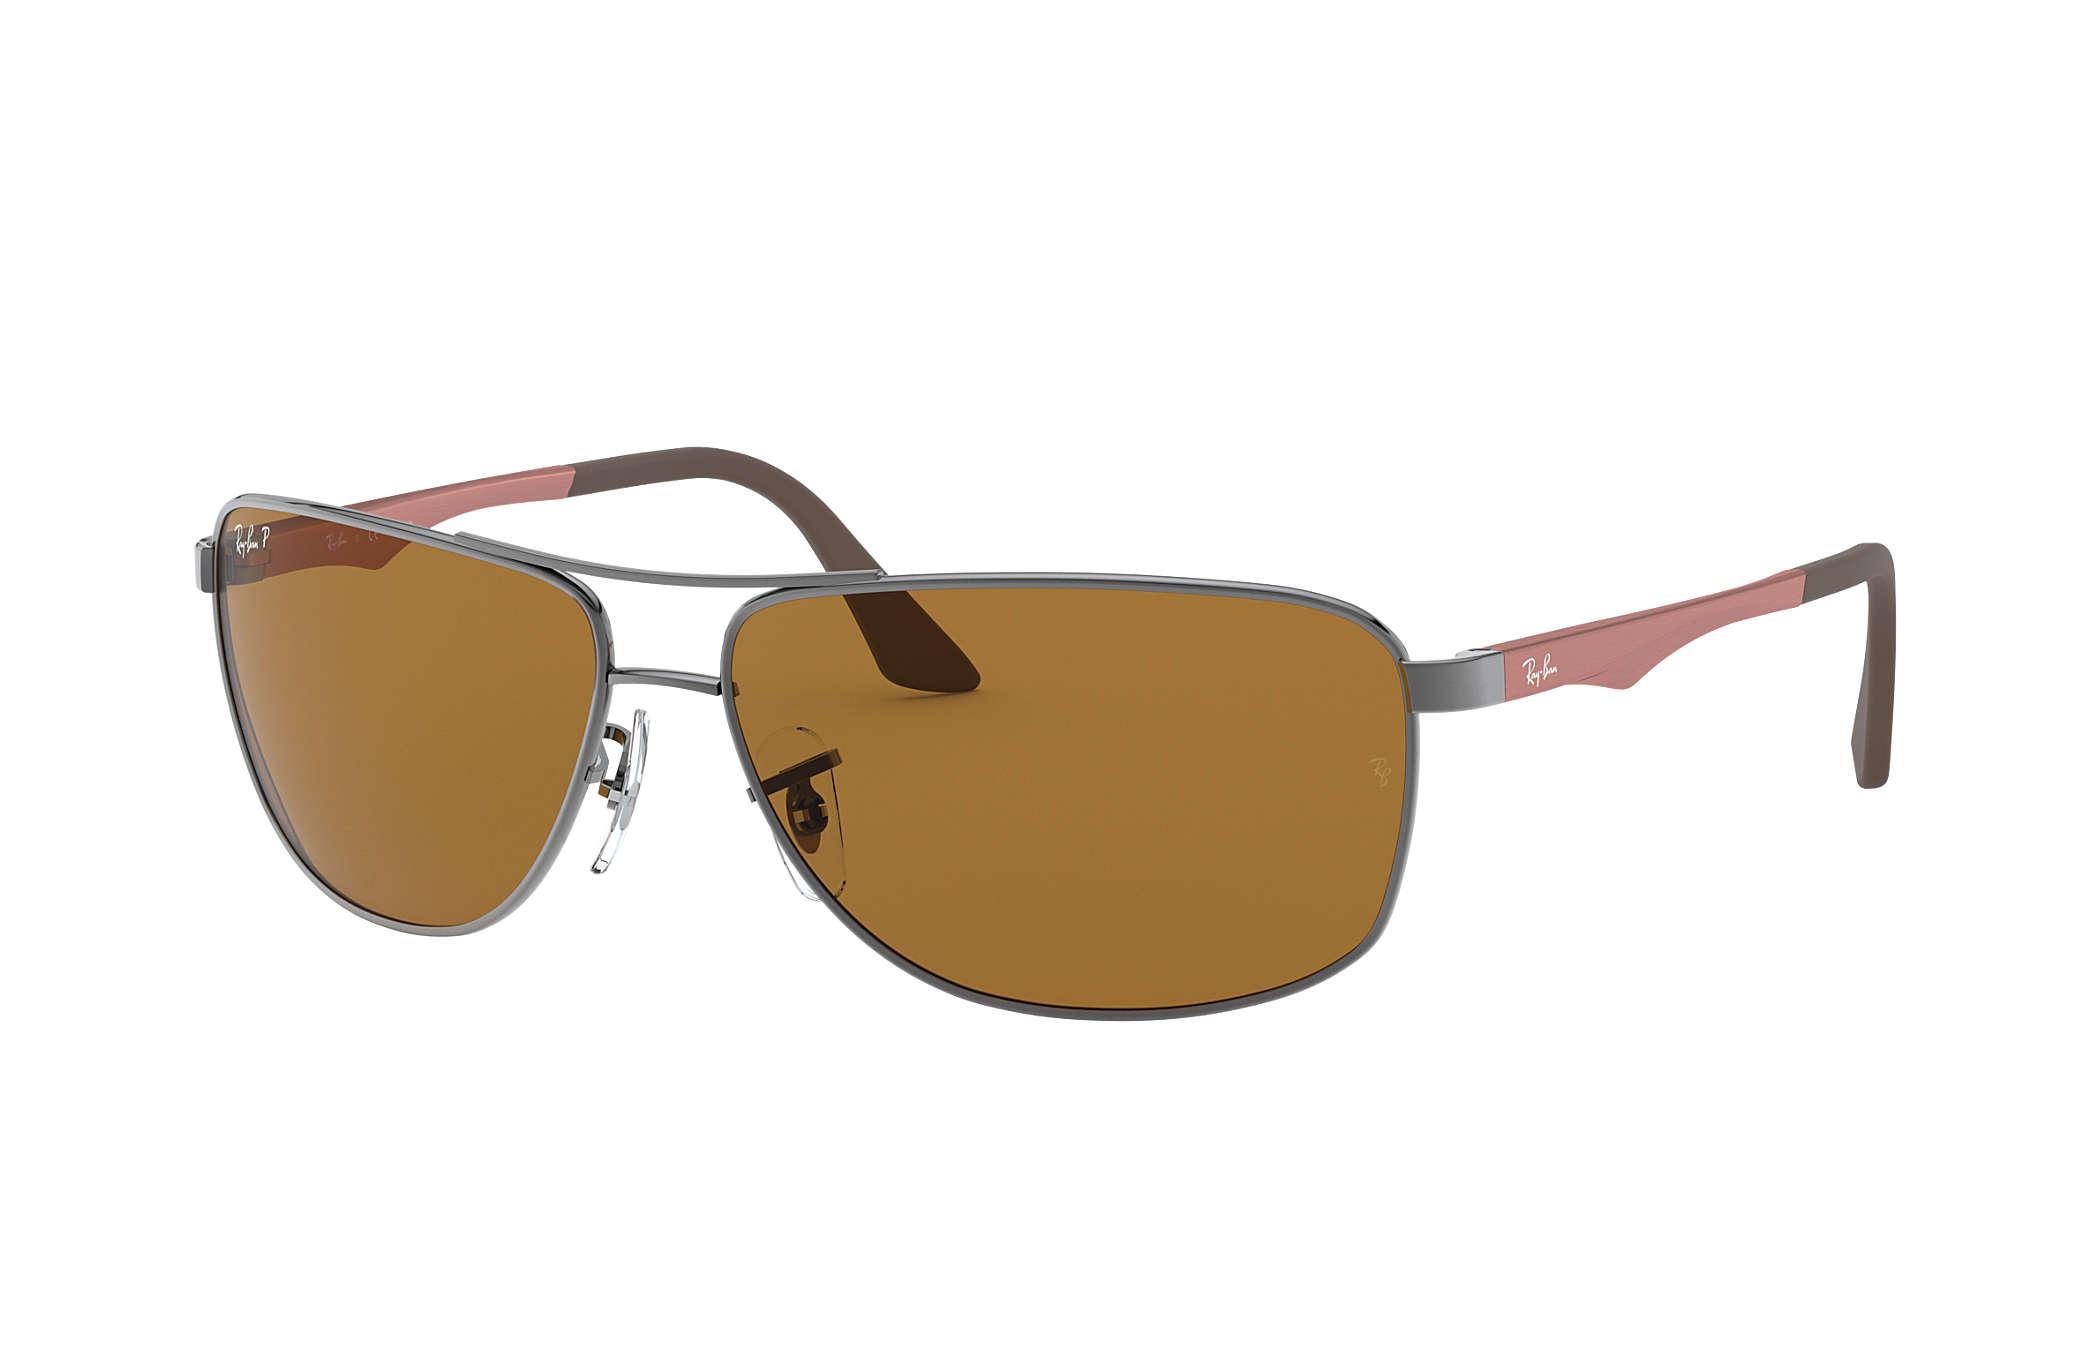 75753424ca500 Ray Ban Rb3506 029 9a Sunglasses - Restaurant and Palinka Bar